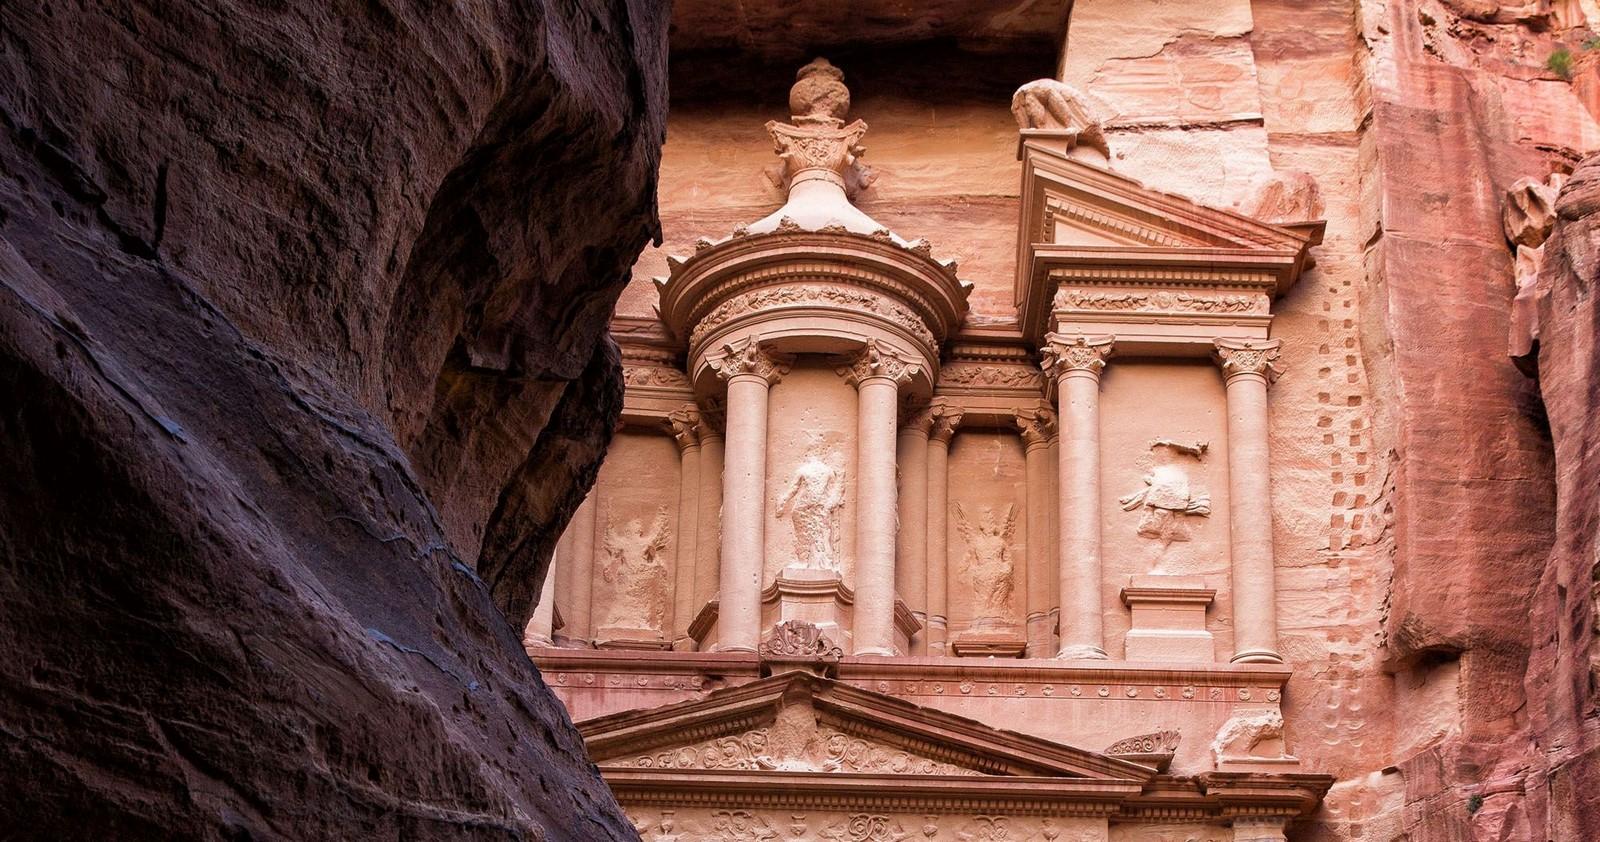 The Ancient city of Petra, South Jordan - Sheet2